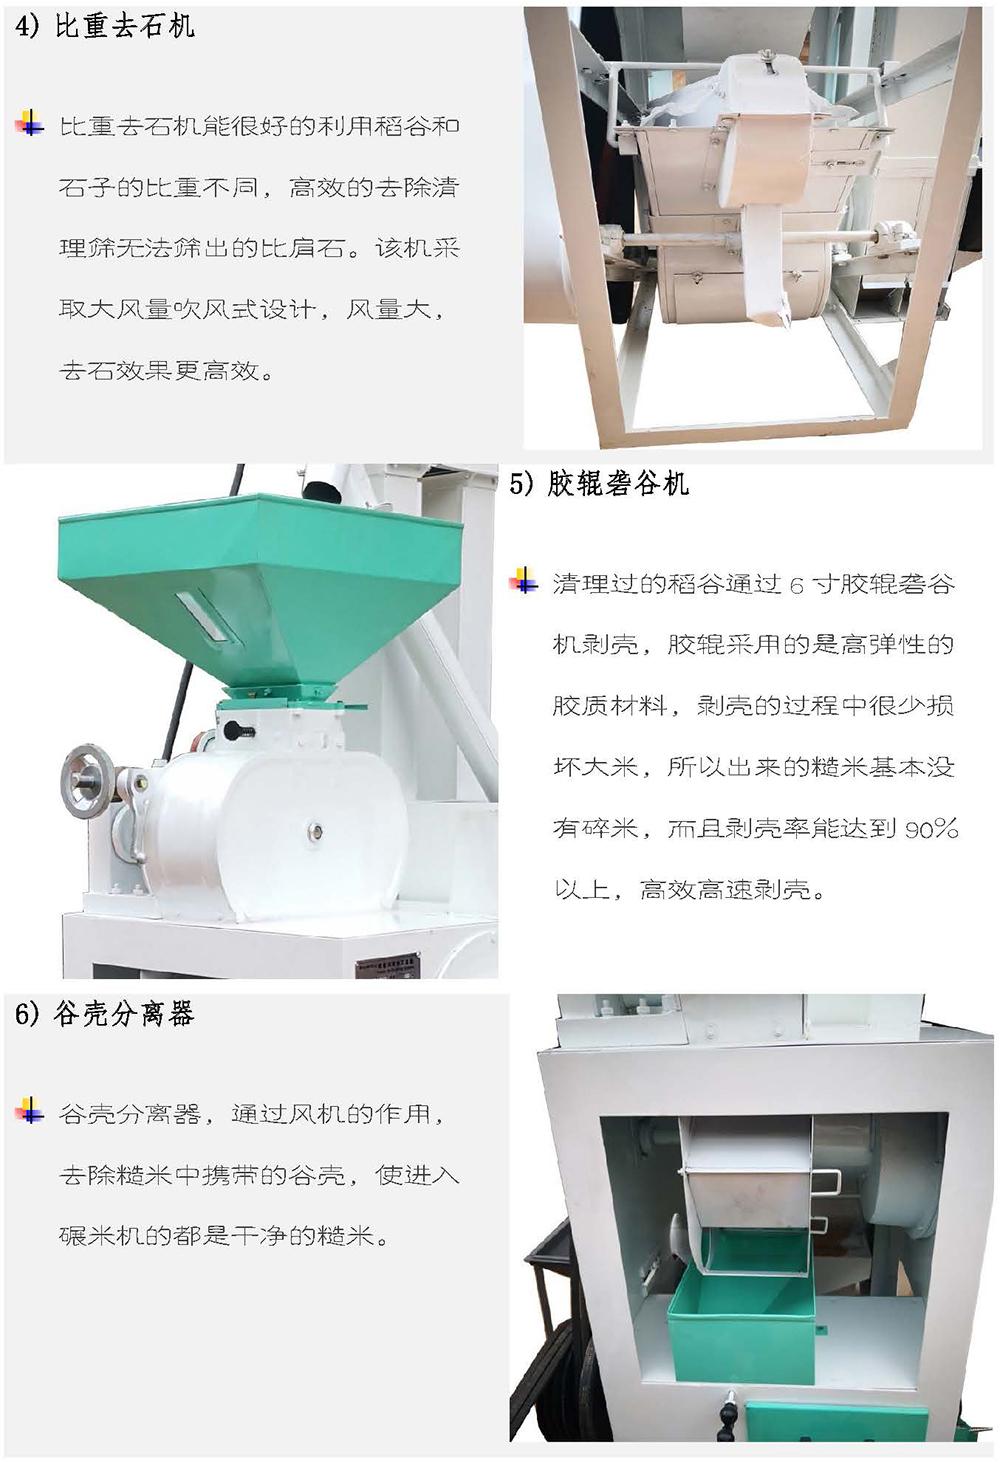 6LN-15-8.5SR礱碾組合米機-柴油機驅動-中文版_頁面_4